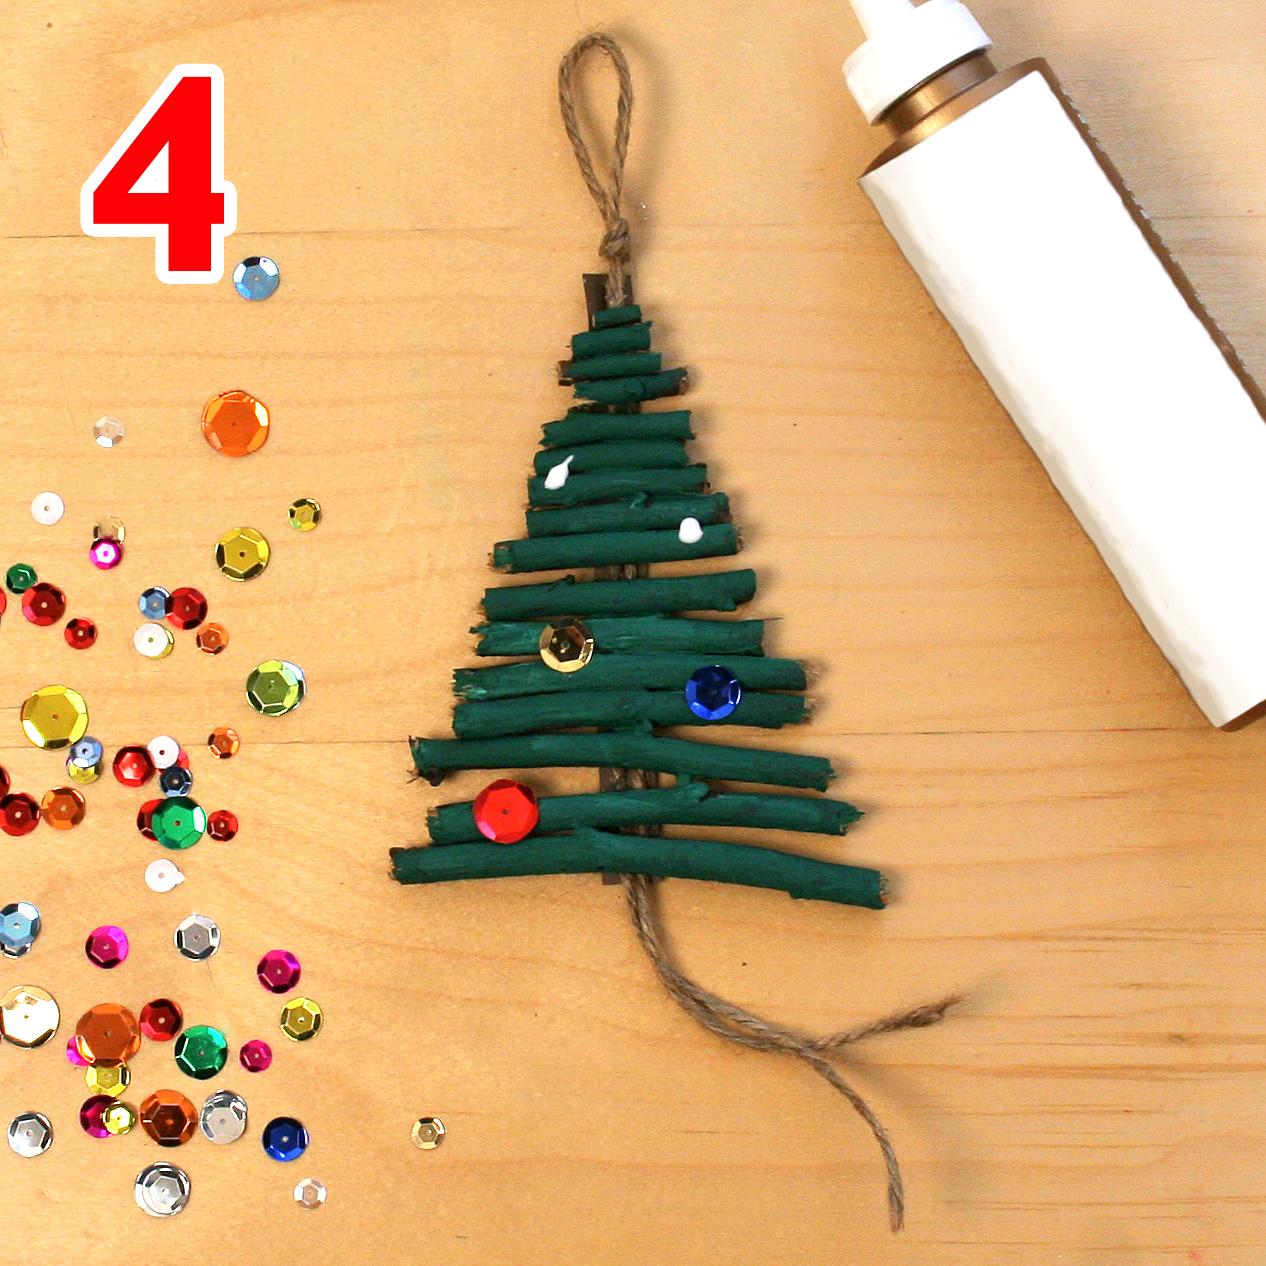 Christmas tree ornament craft step 4